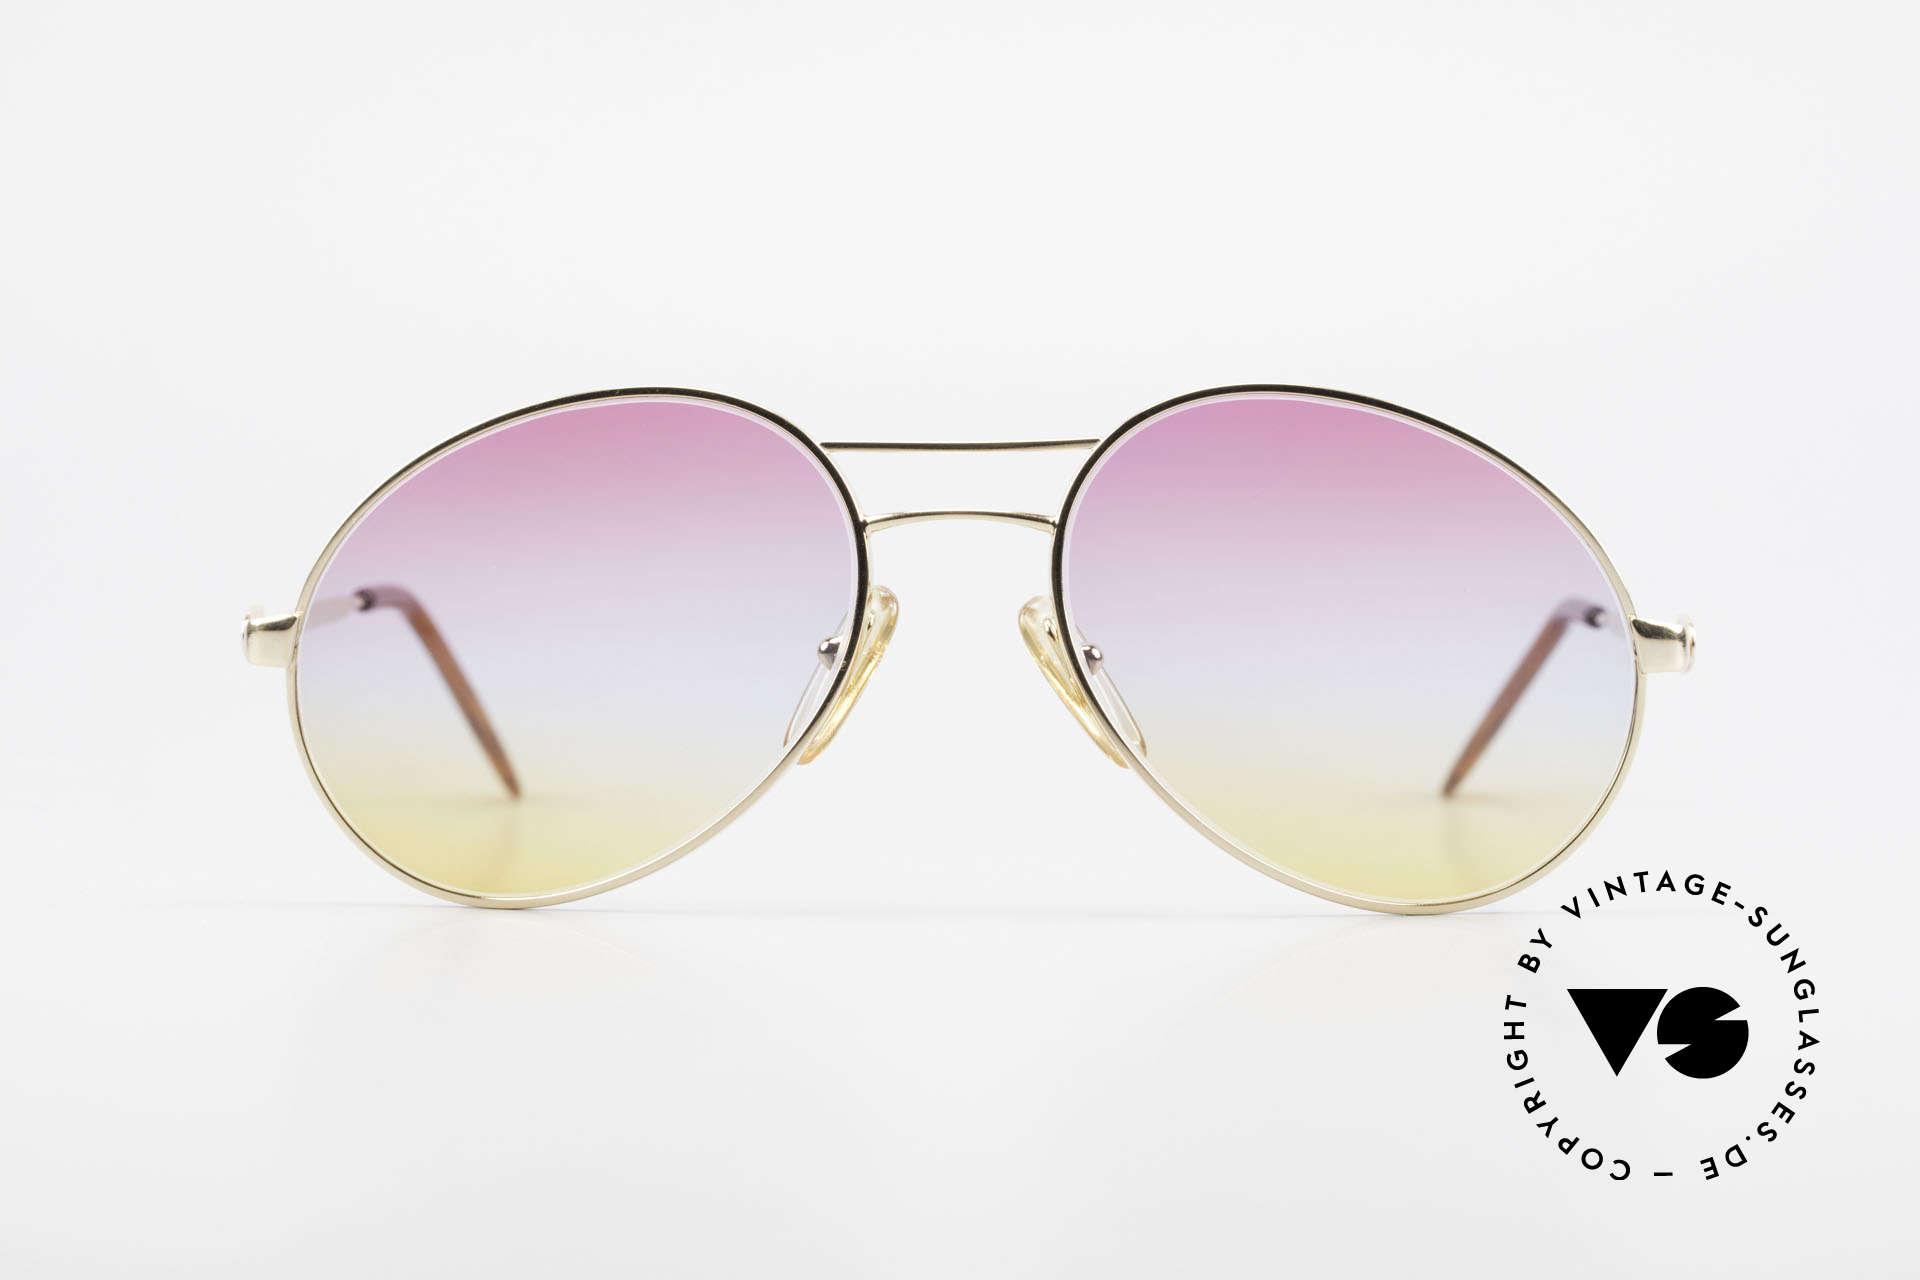 Bugatti 64335 Extraordinary 80's Sunglasses, extraordinary frame design (simply striking), Made for Men